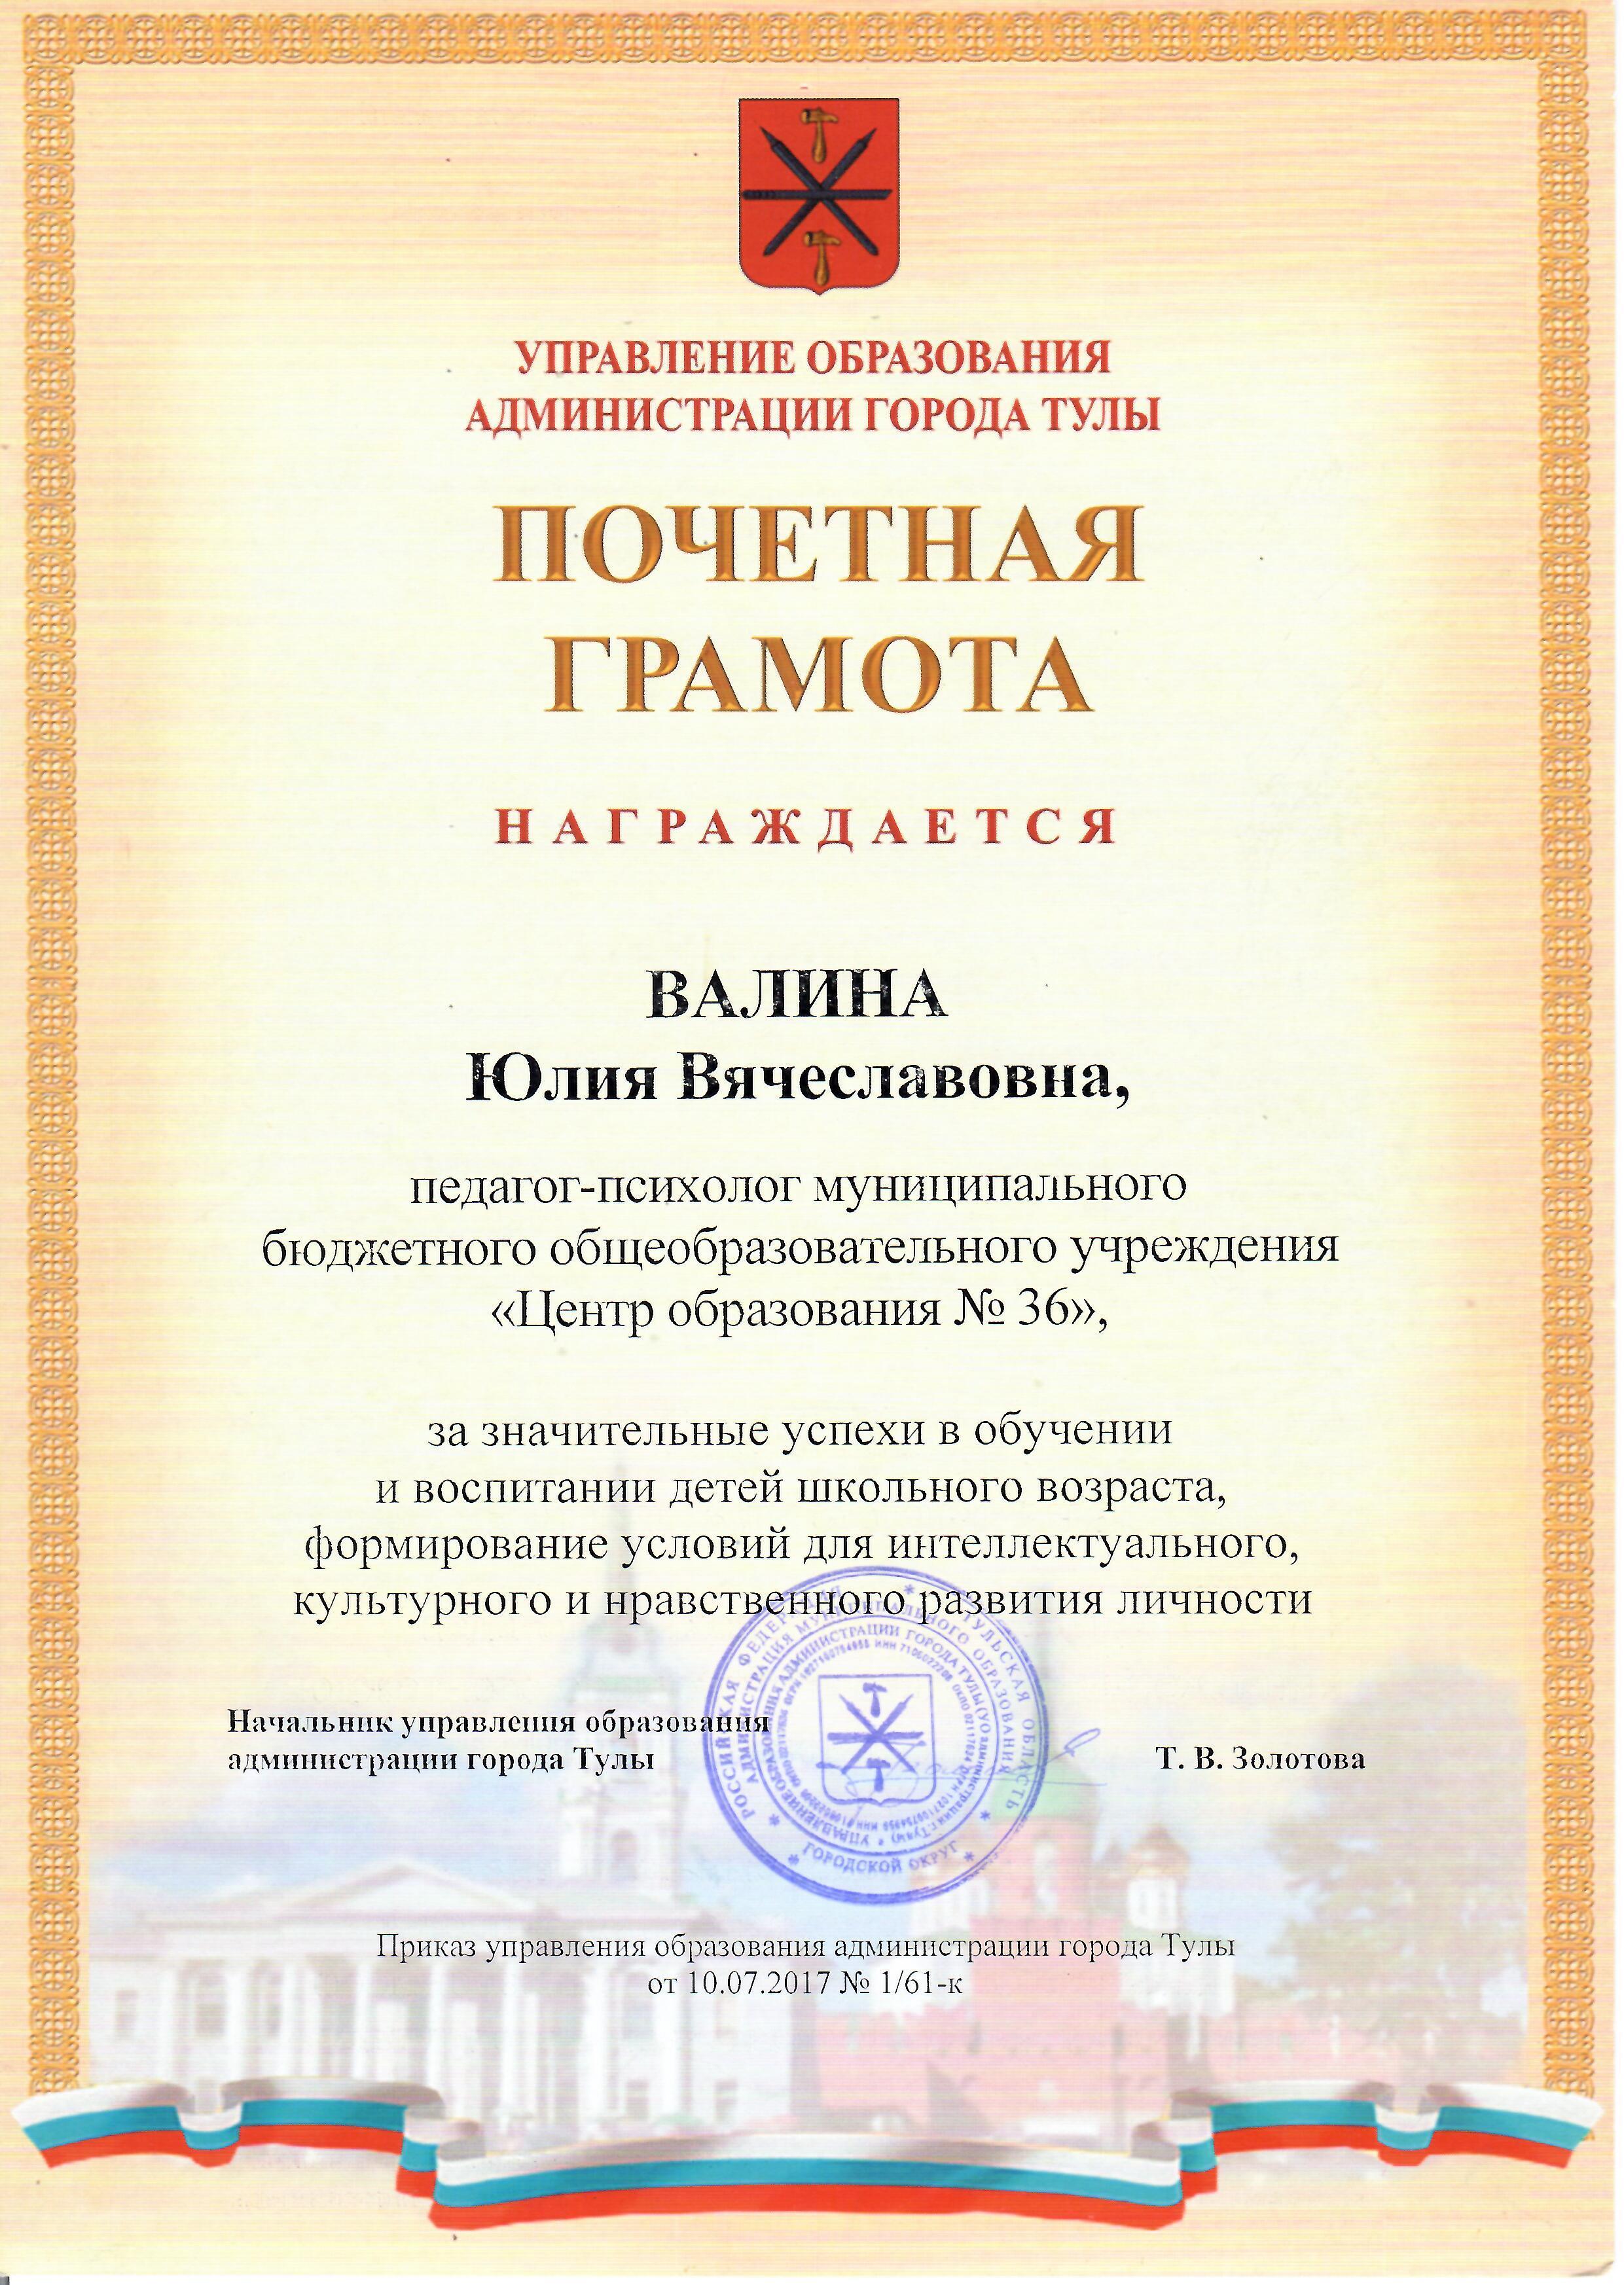 Грамота УО Валиной Ю.В.